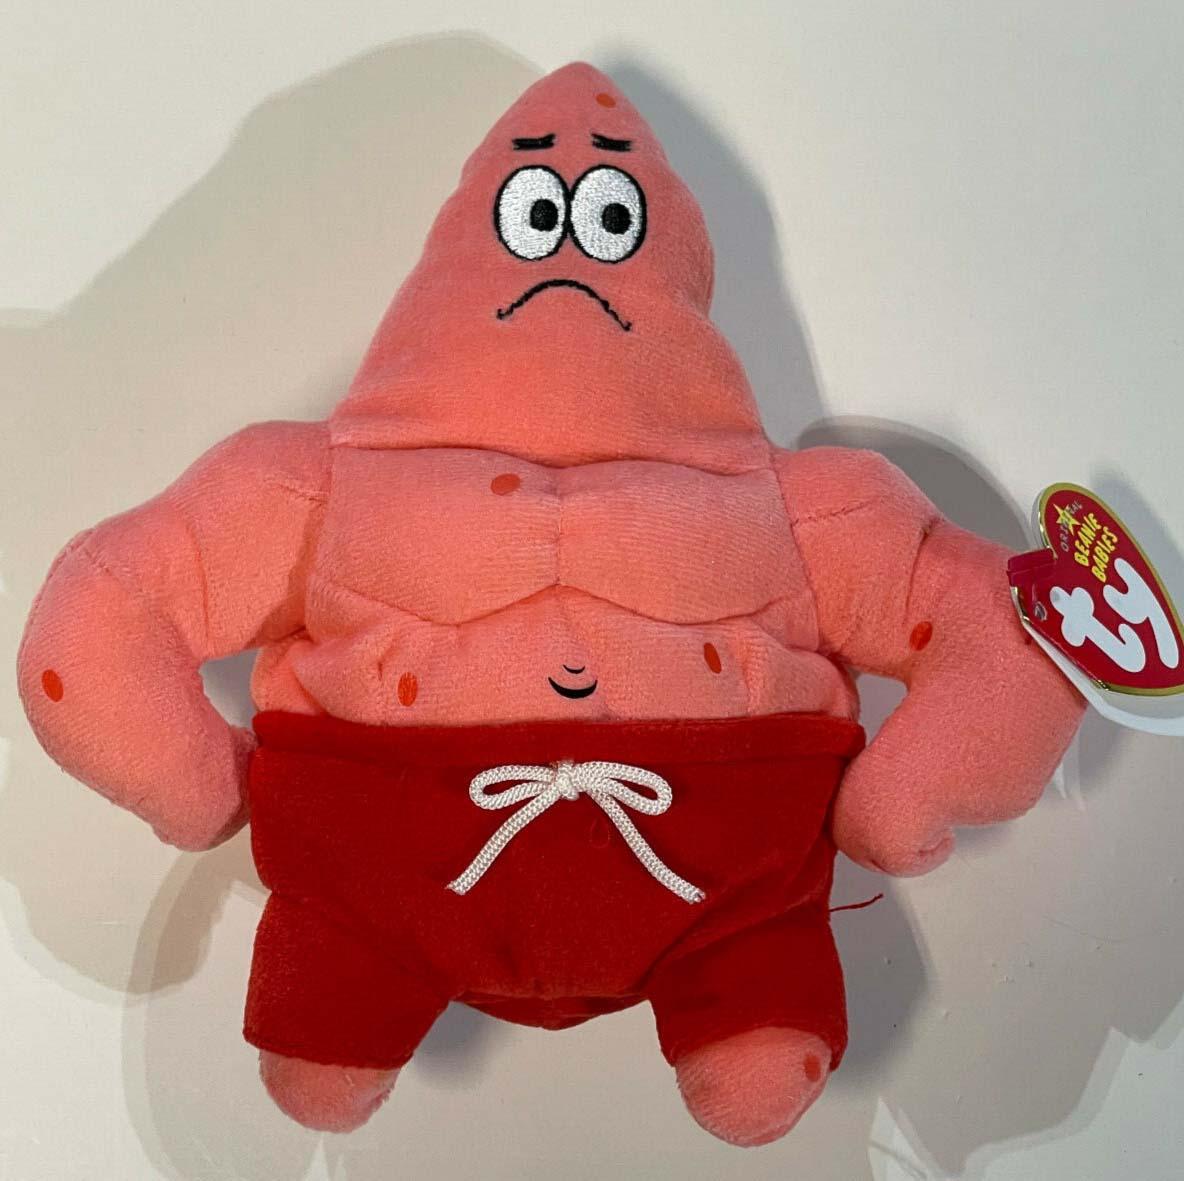 File:SpongeBob Patrick Muscle Man.jpg